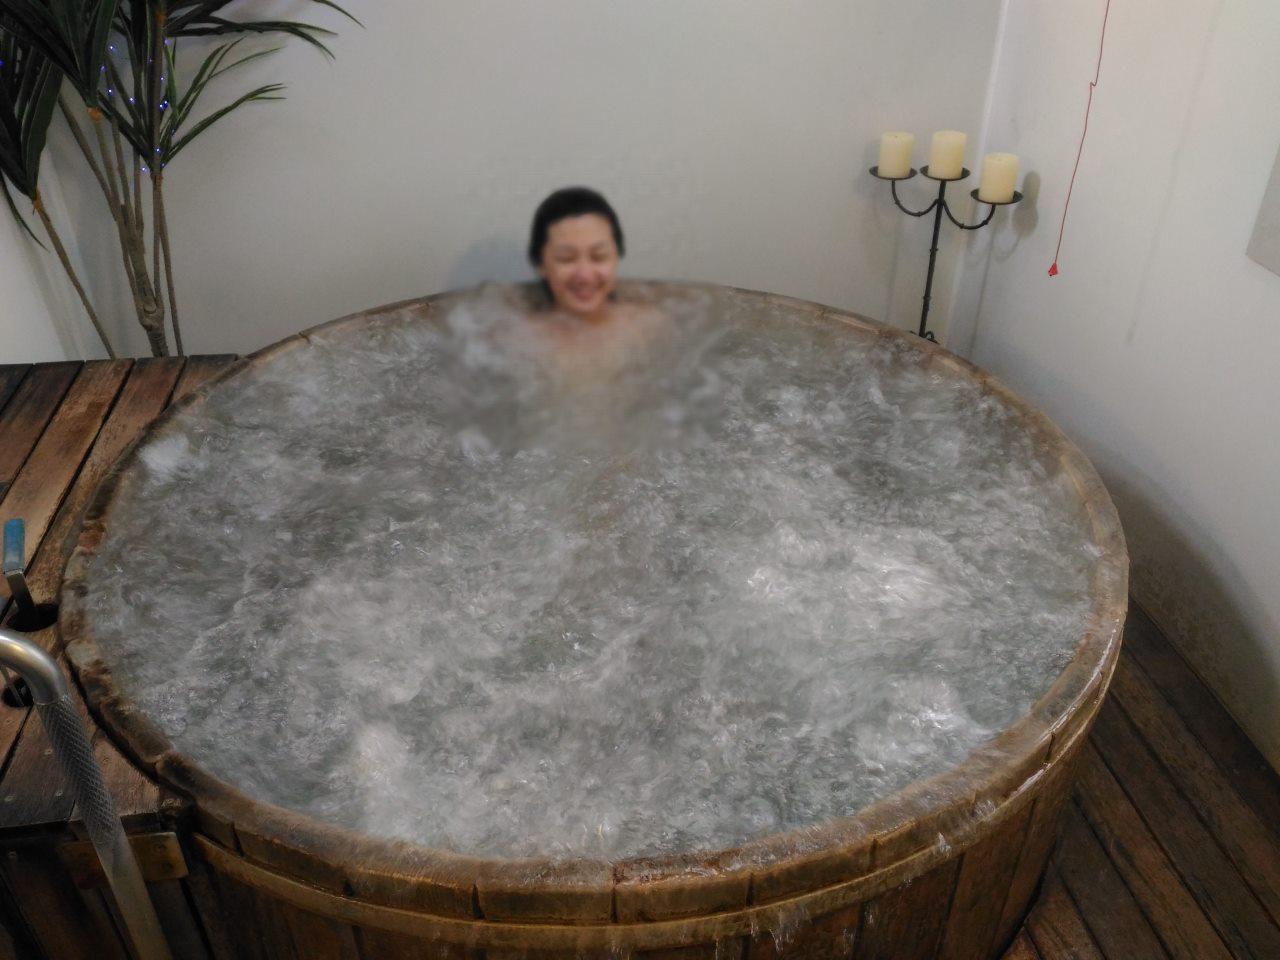 NZ随一の美肌の湯!「テ・アロハ温泉」で登山と貸切風呂を満喫しよう!